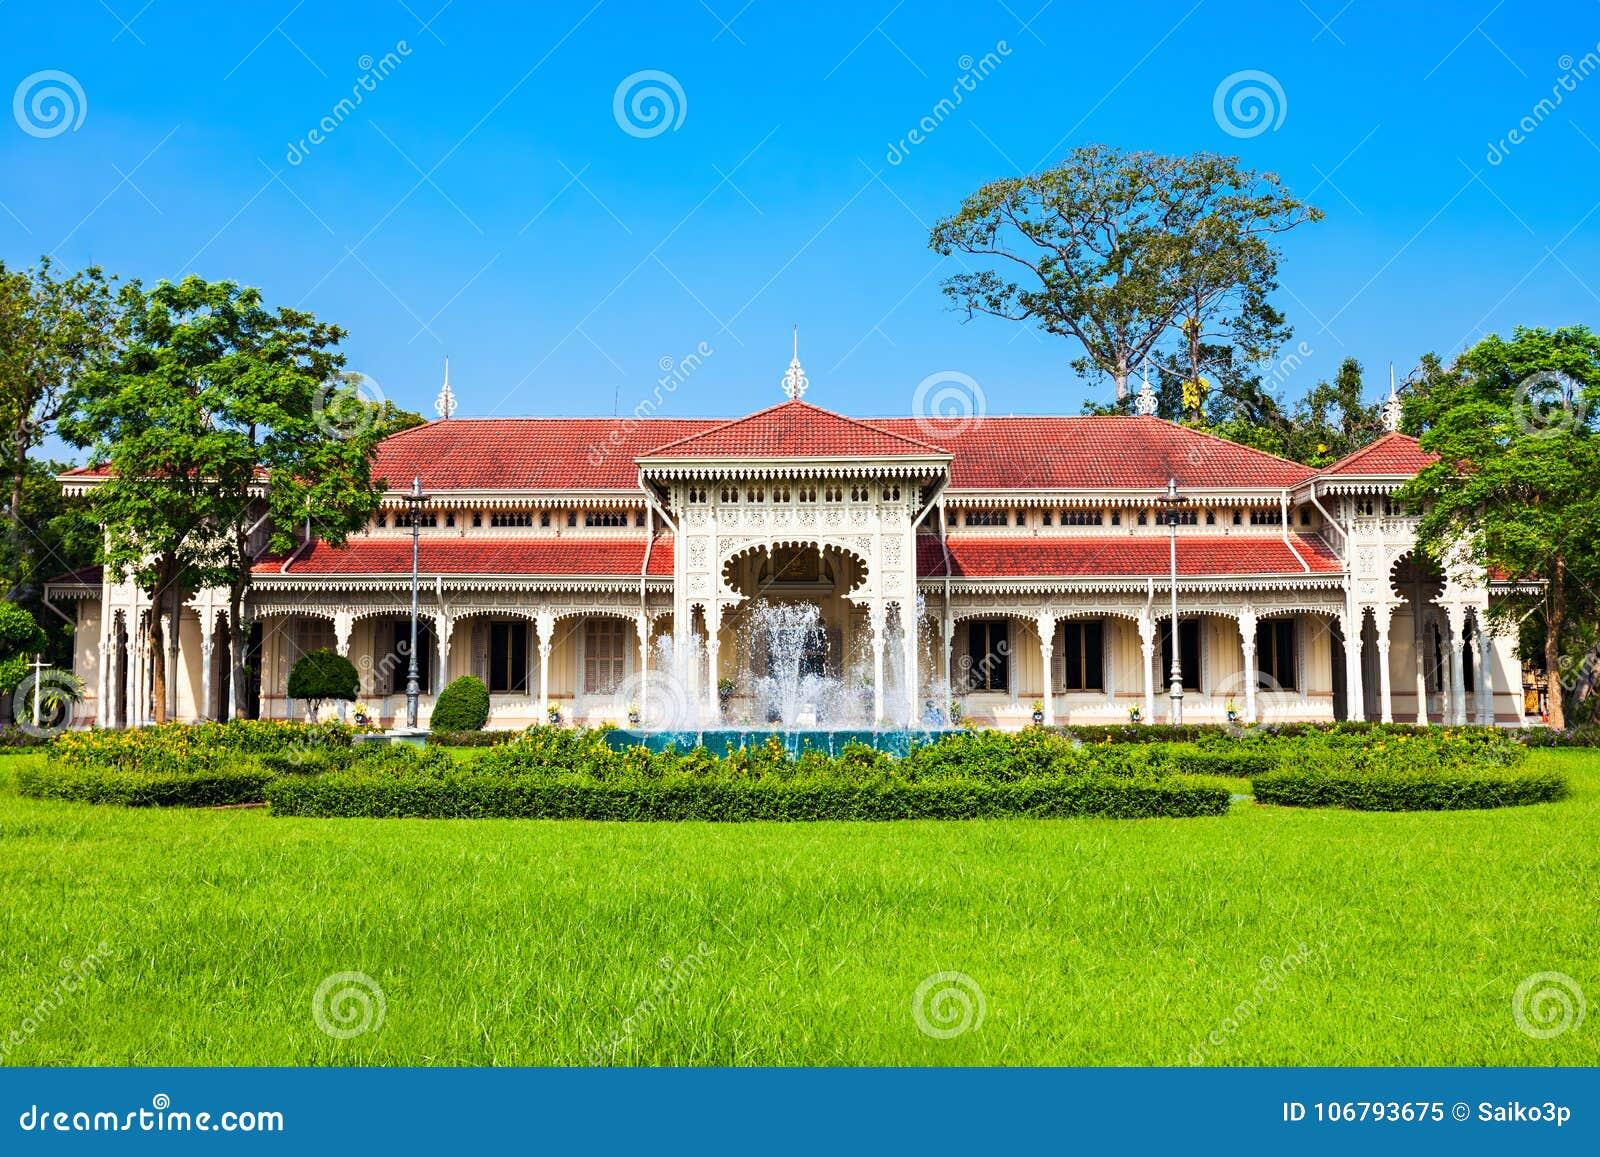 Abhisek Dusit Throne Hall Stock Image Image Of Landmark 106793675